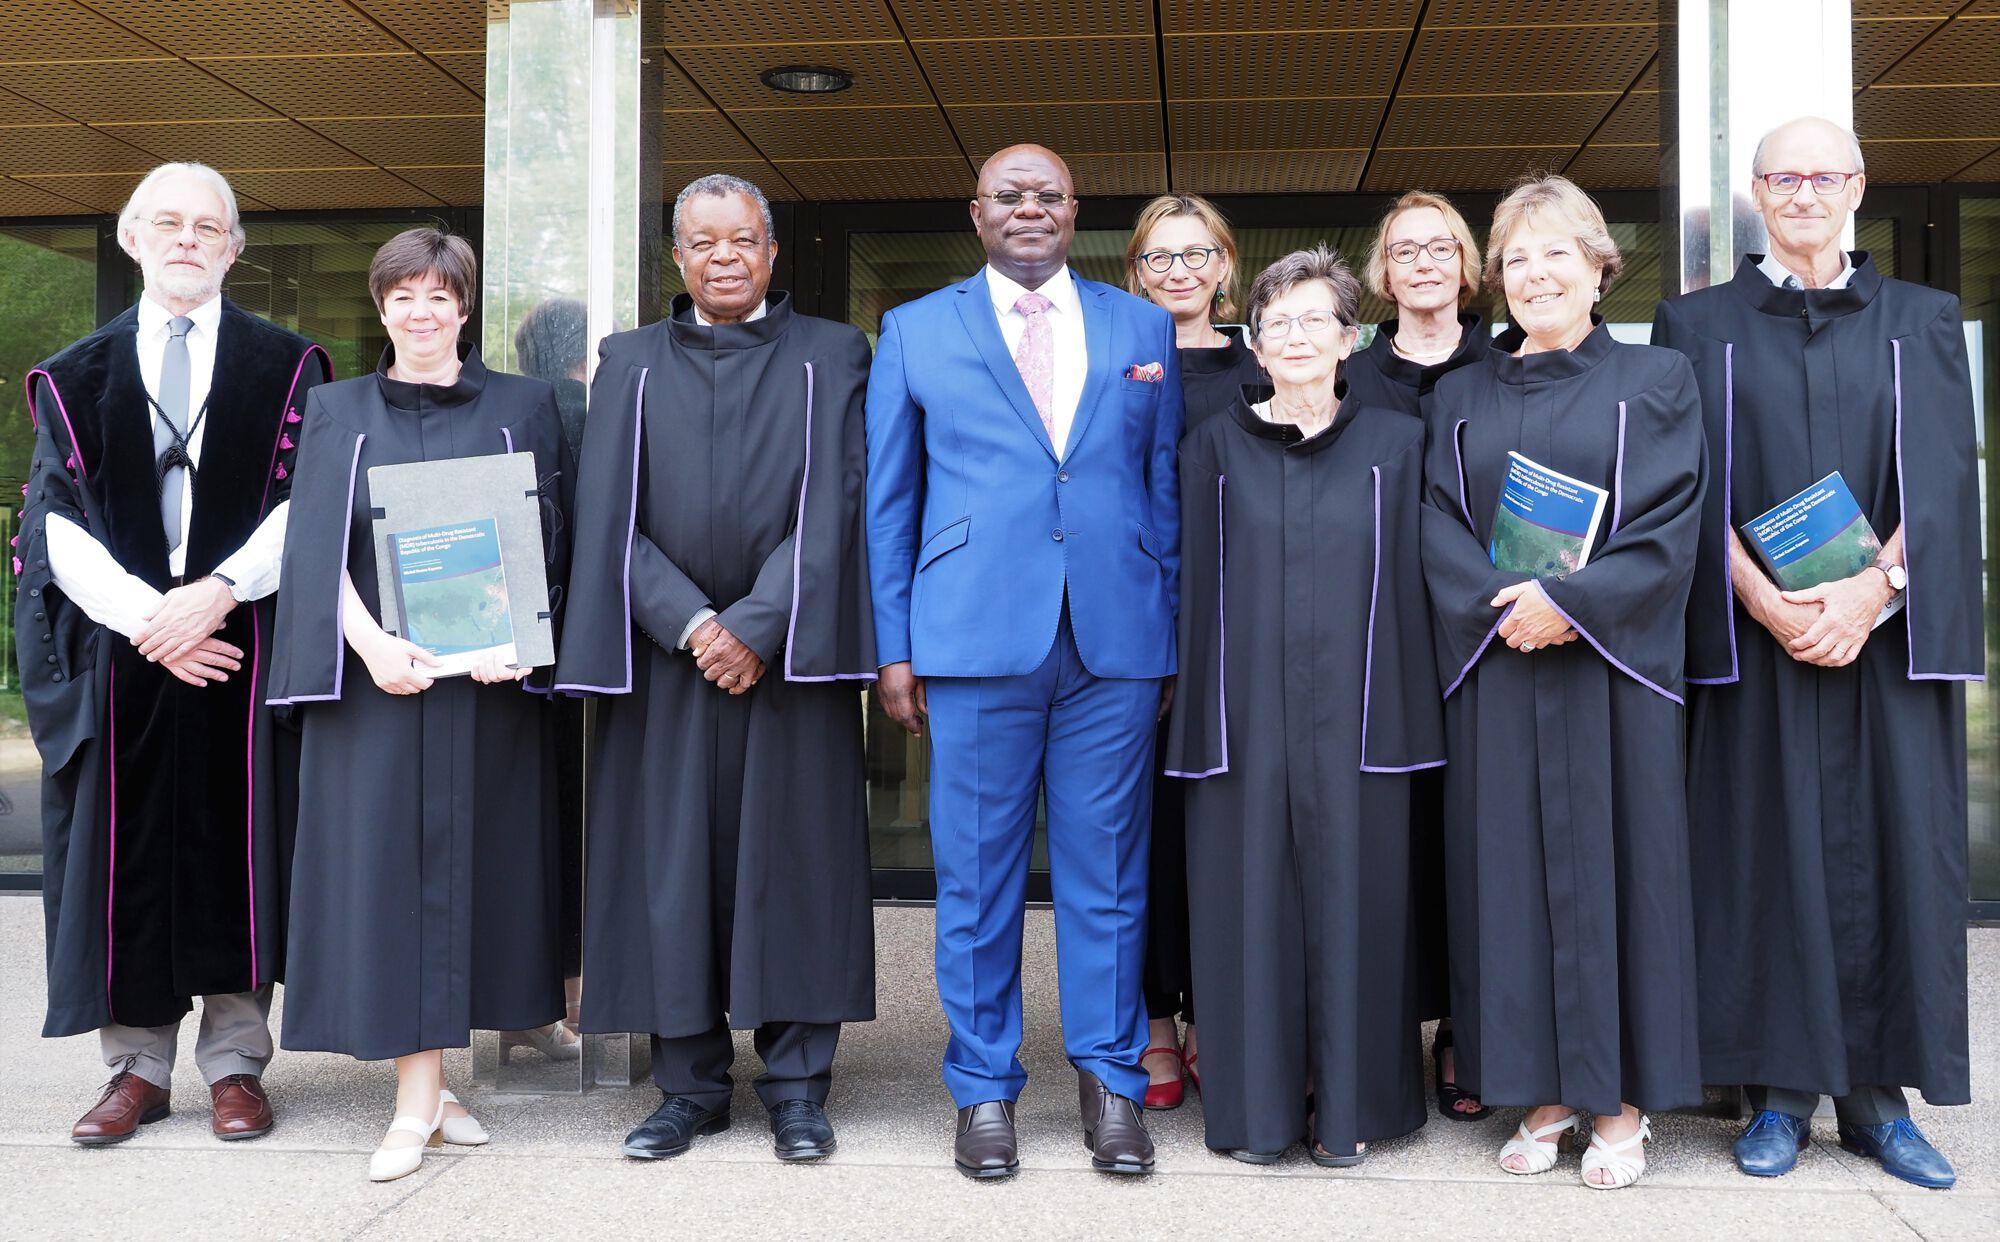 Doctoraatsverdediging Michel Kaswa Kayomo - 6 juli 2018